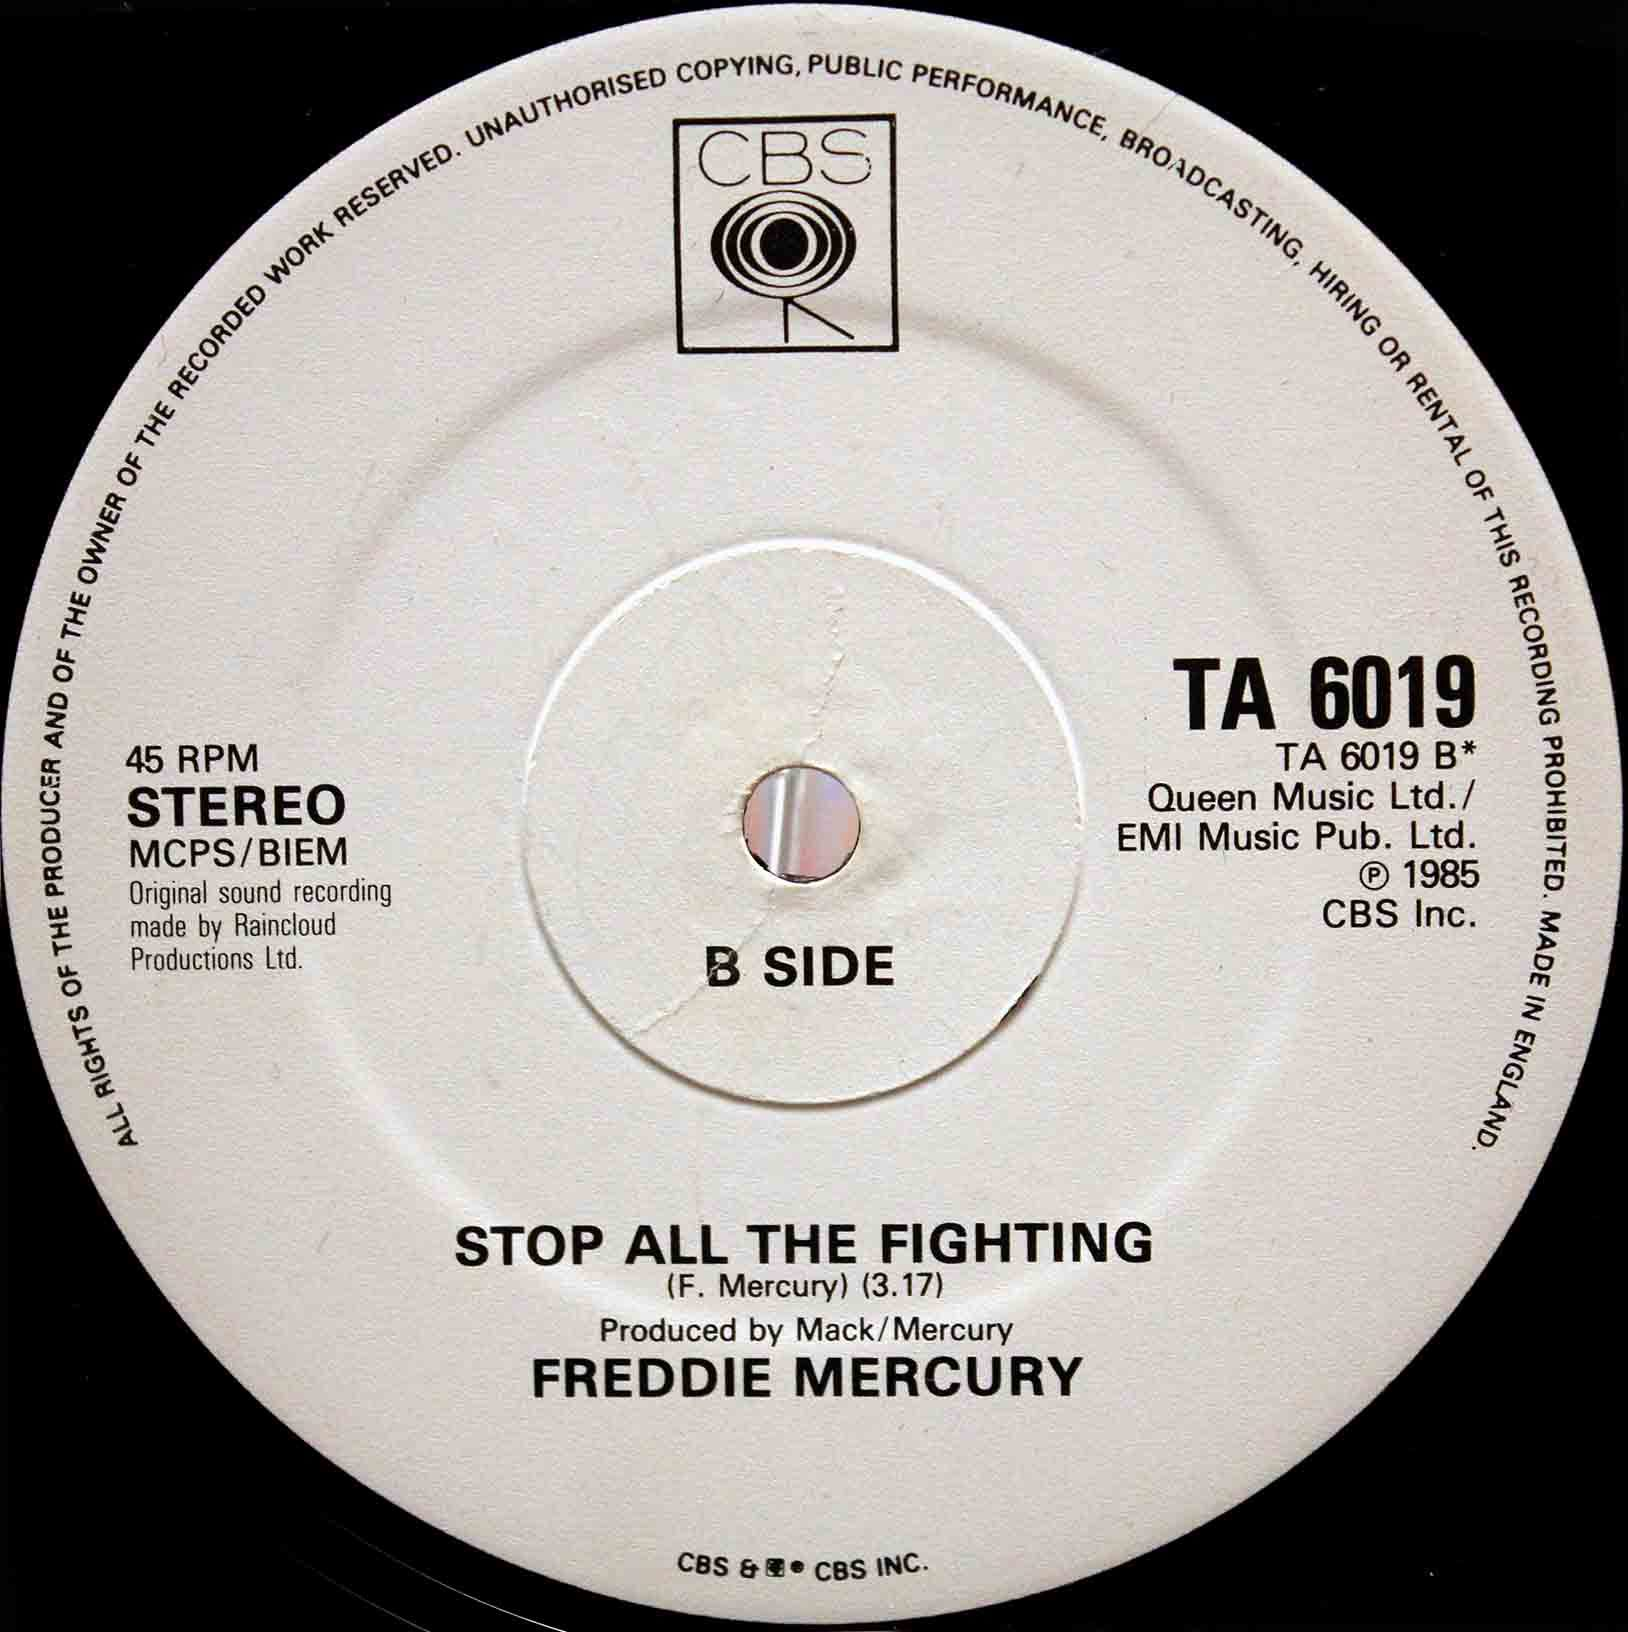 Freddie Mercury – I Was Born To Love You 04